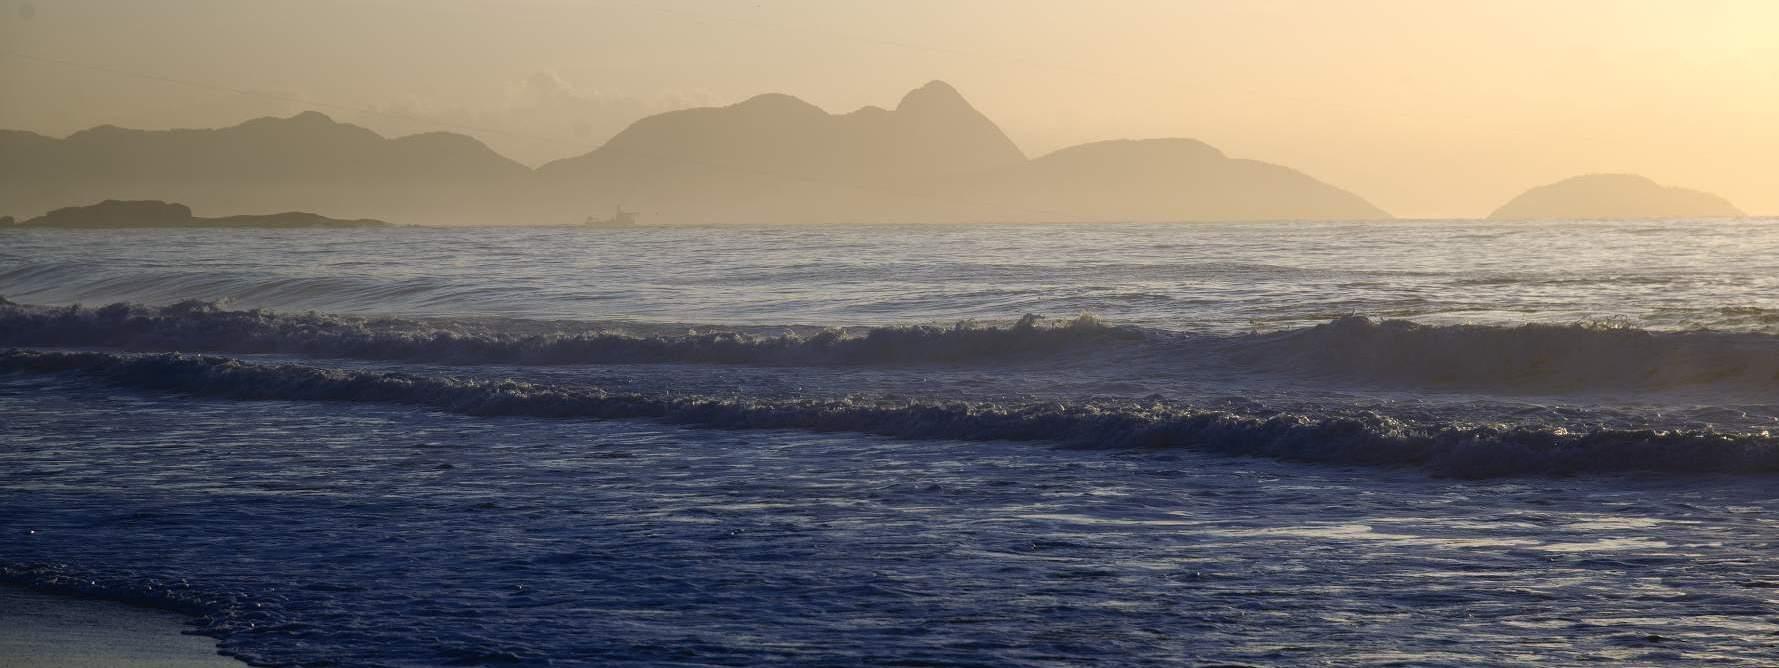 copacabana-beach-view